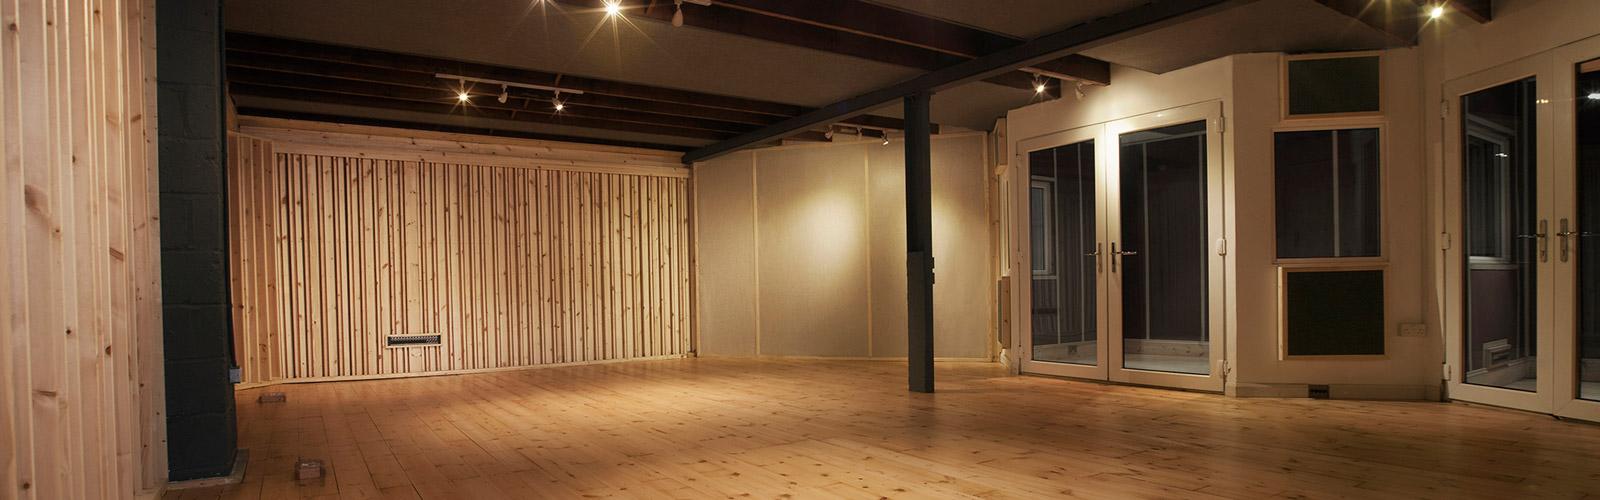 Loft Music Studios - Live Room 1